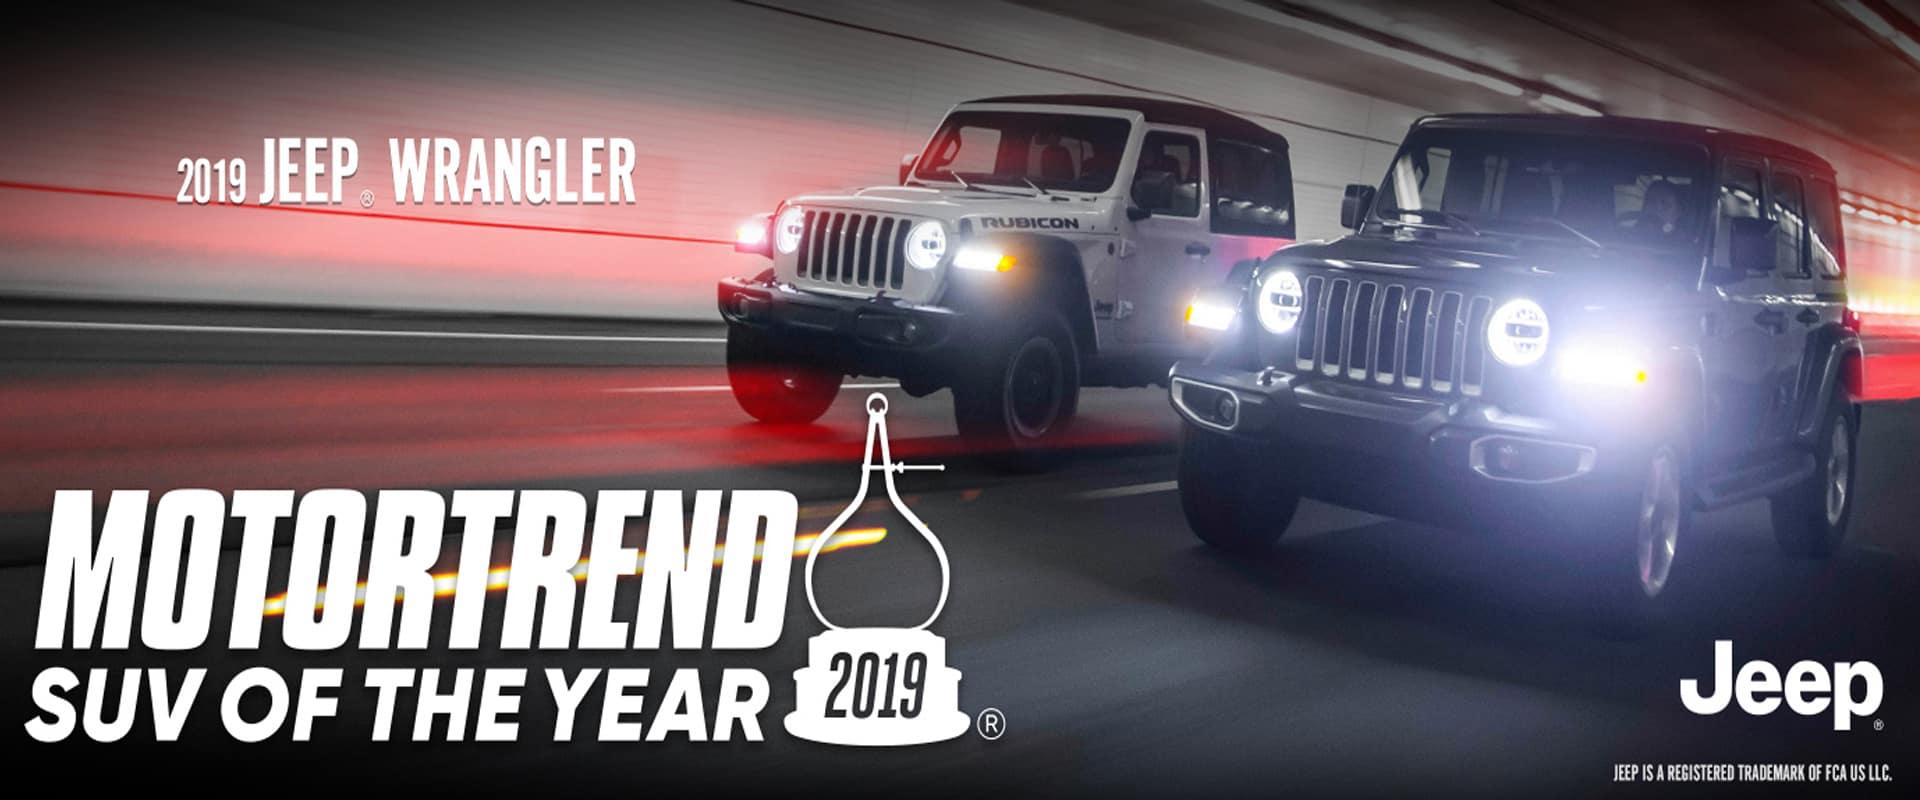 Used Car Dealerships Idaho Falls >> Ron Sayer S Chrysler Jeep Dodge Cdjr Dealer In Idaho Falls Id